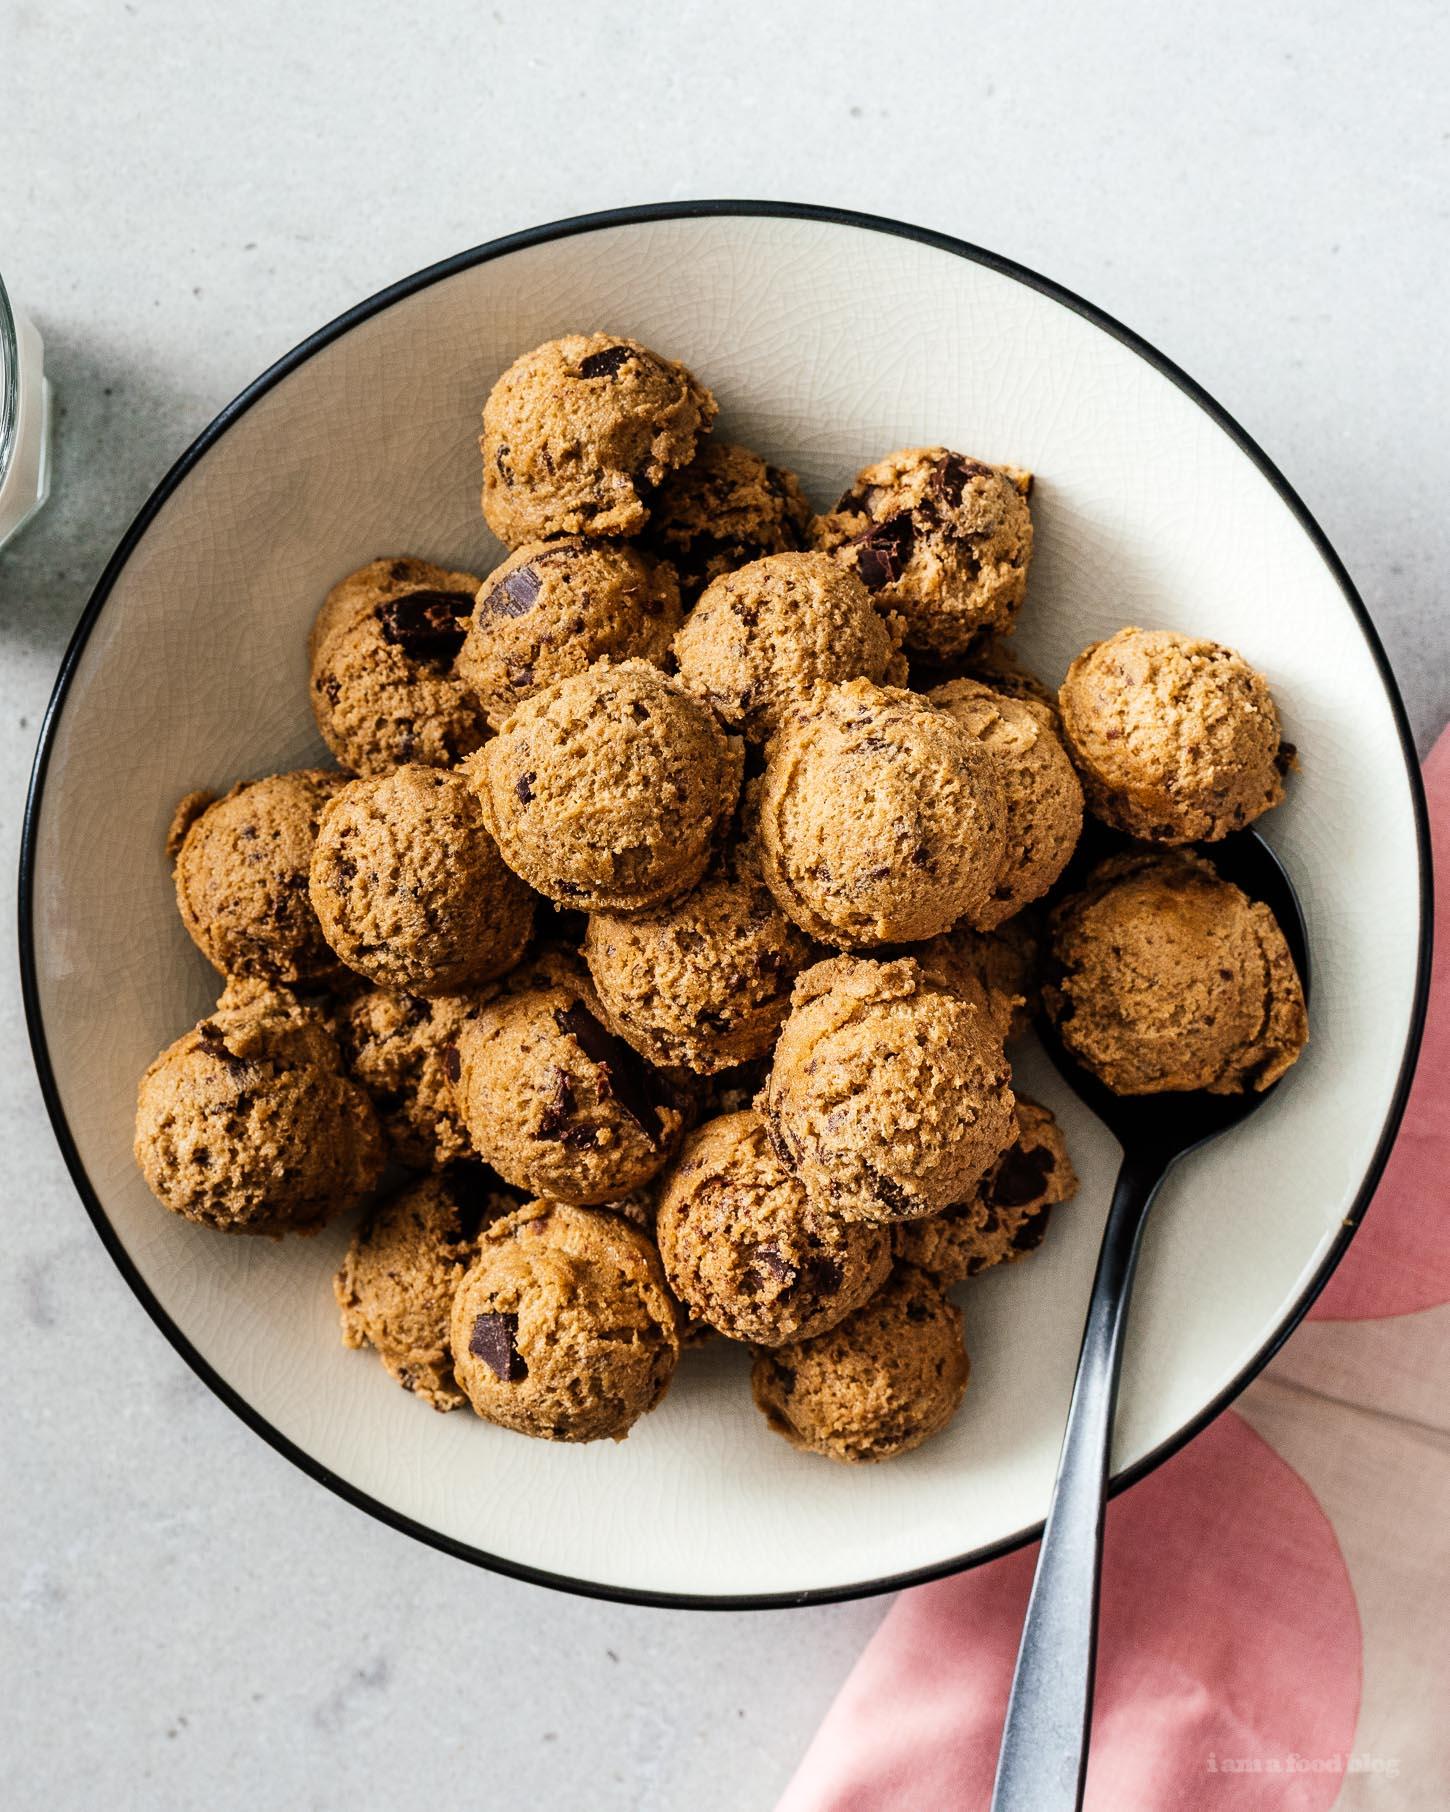 edible cookie dough recipe | www.iamafoodblog.com